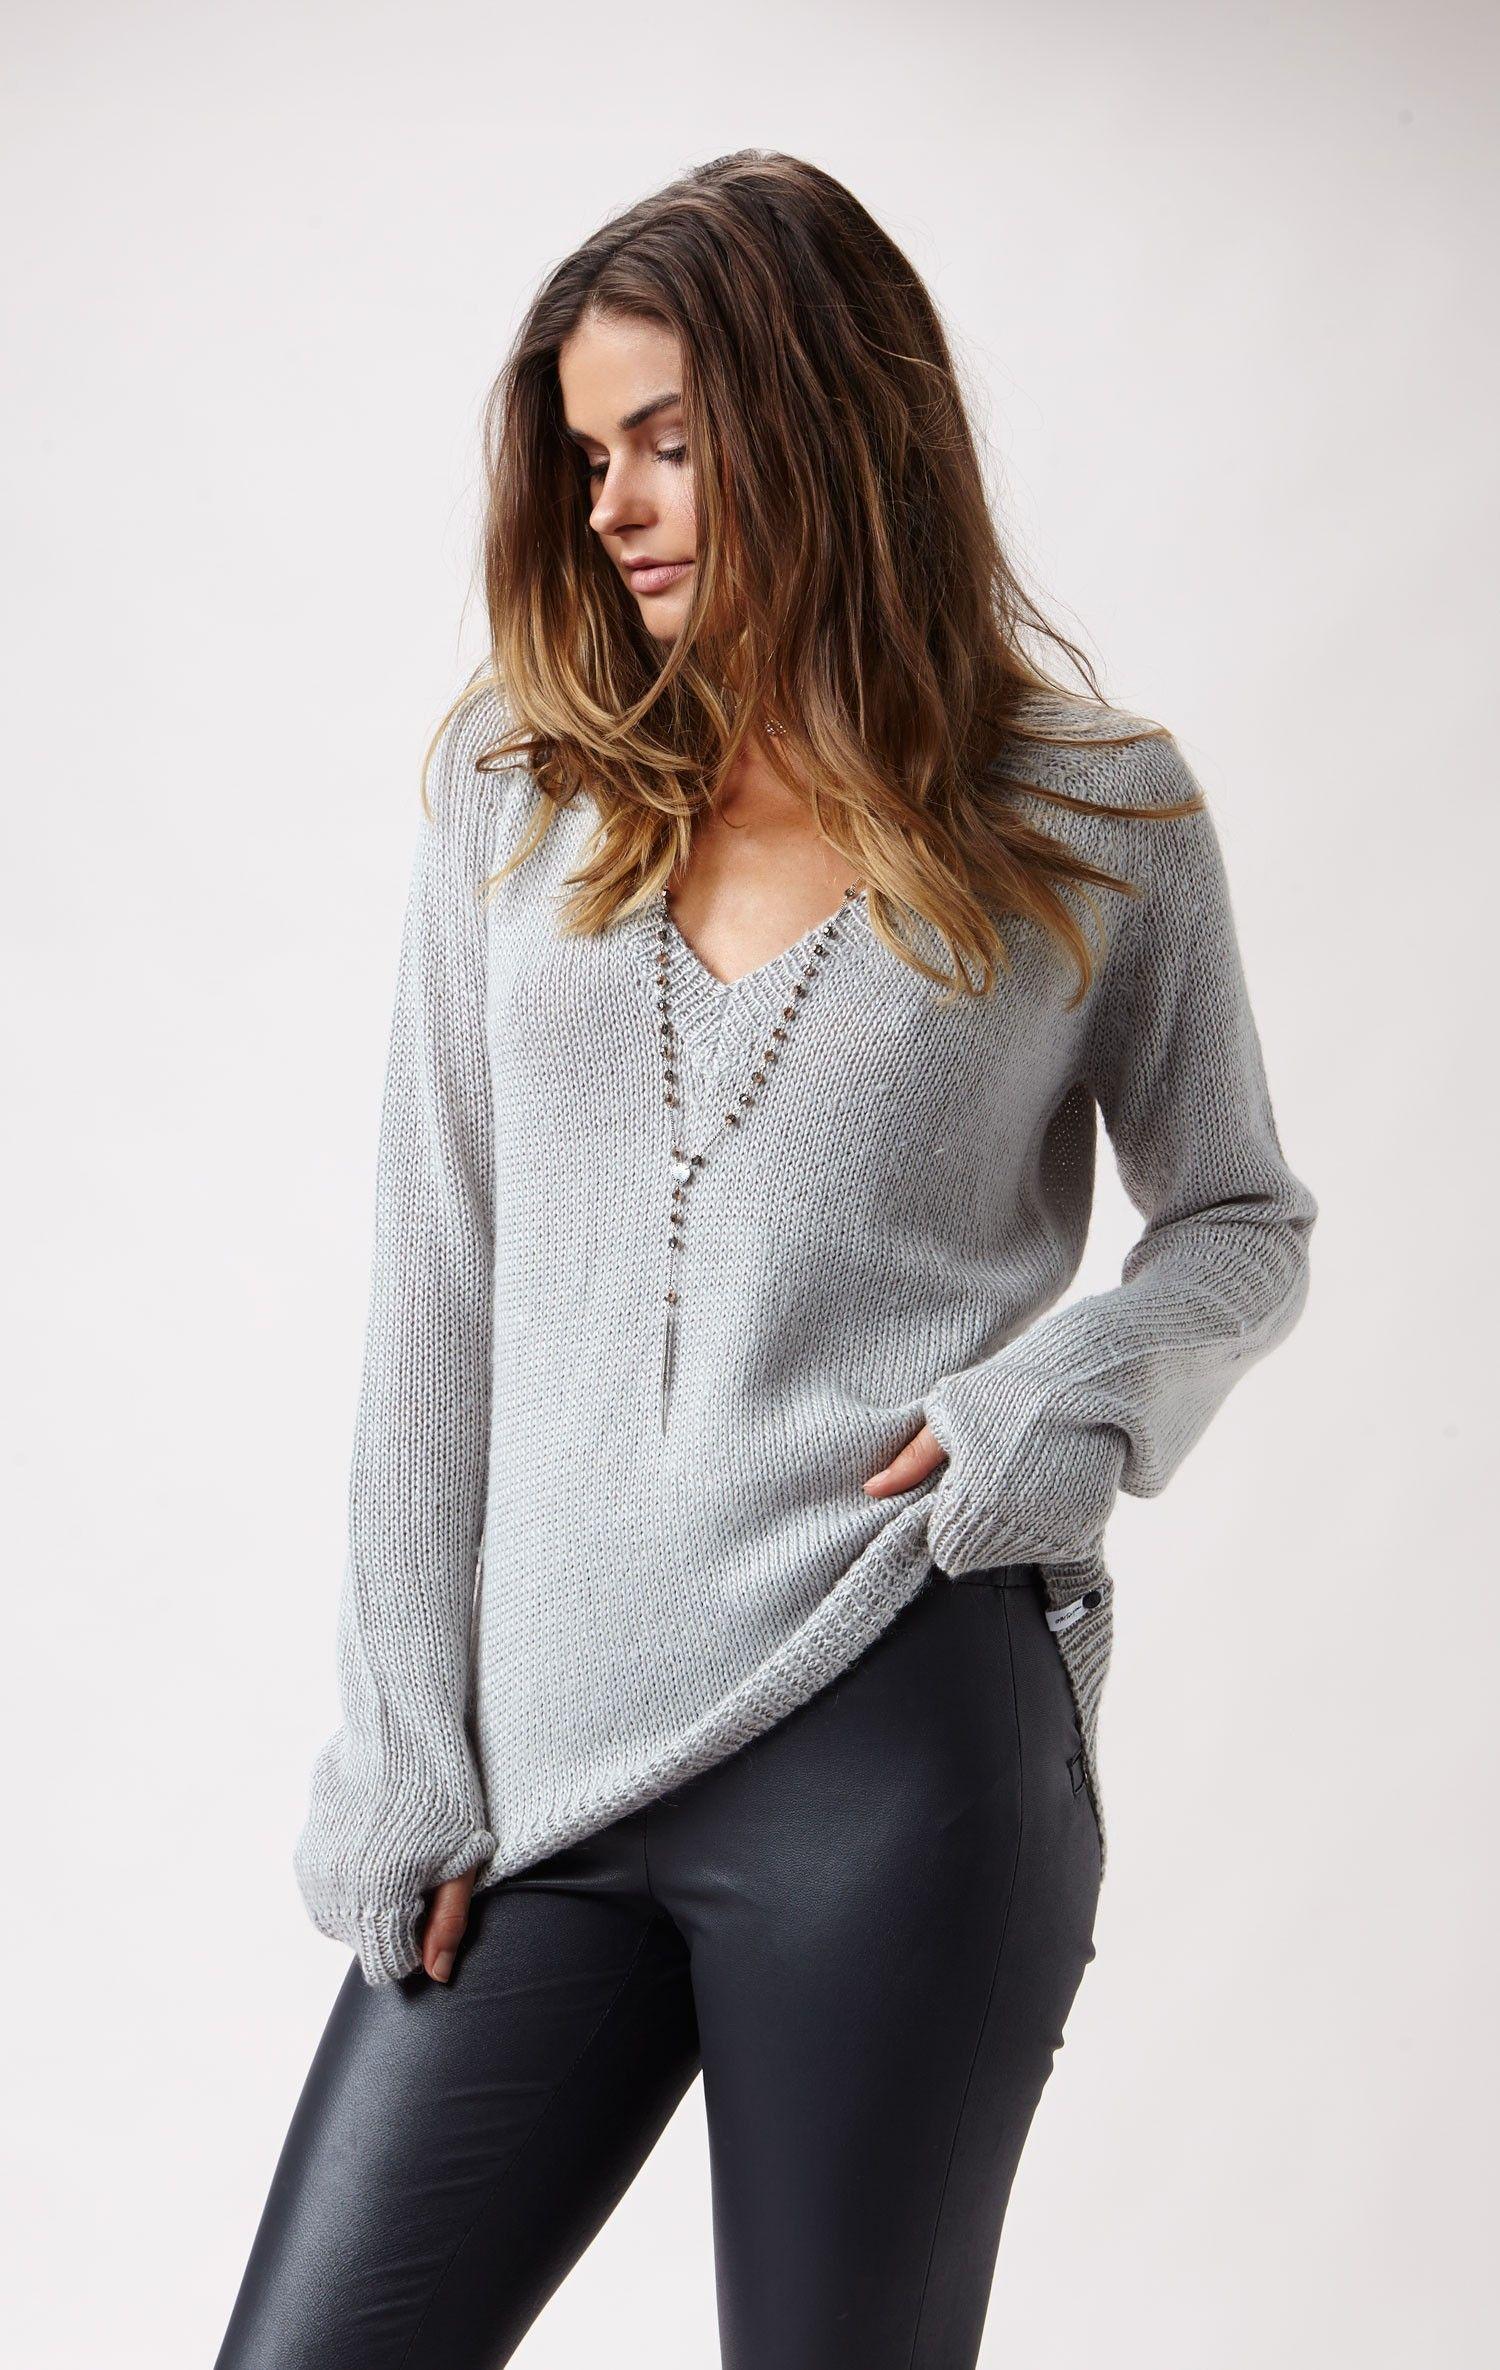 snug knit v-neck sweater by ONE TEASPOON #planetblue